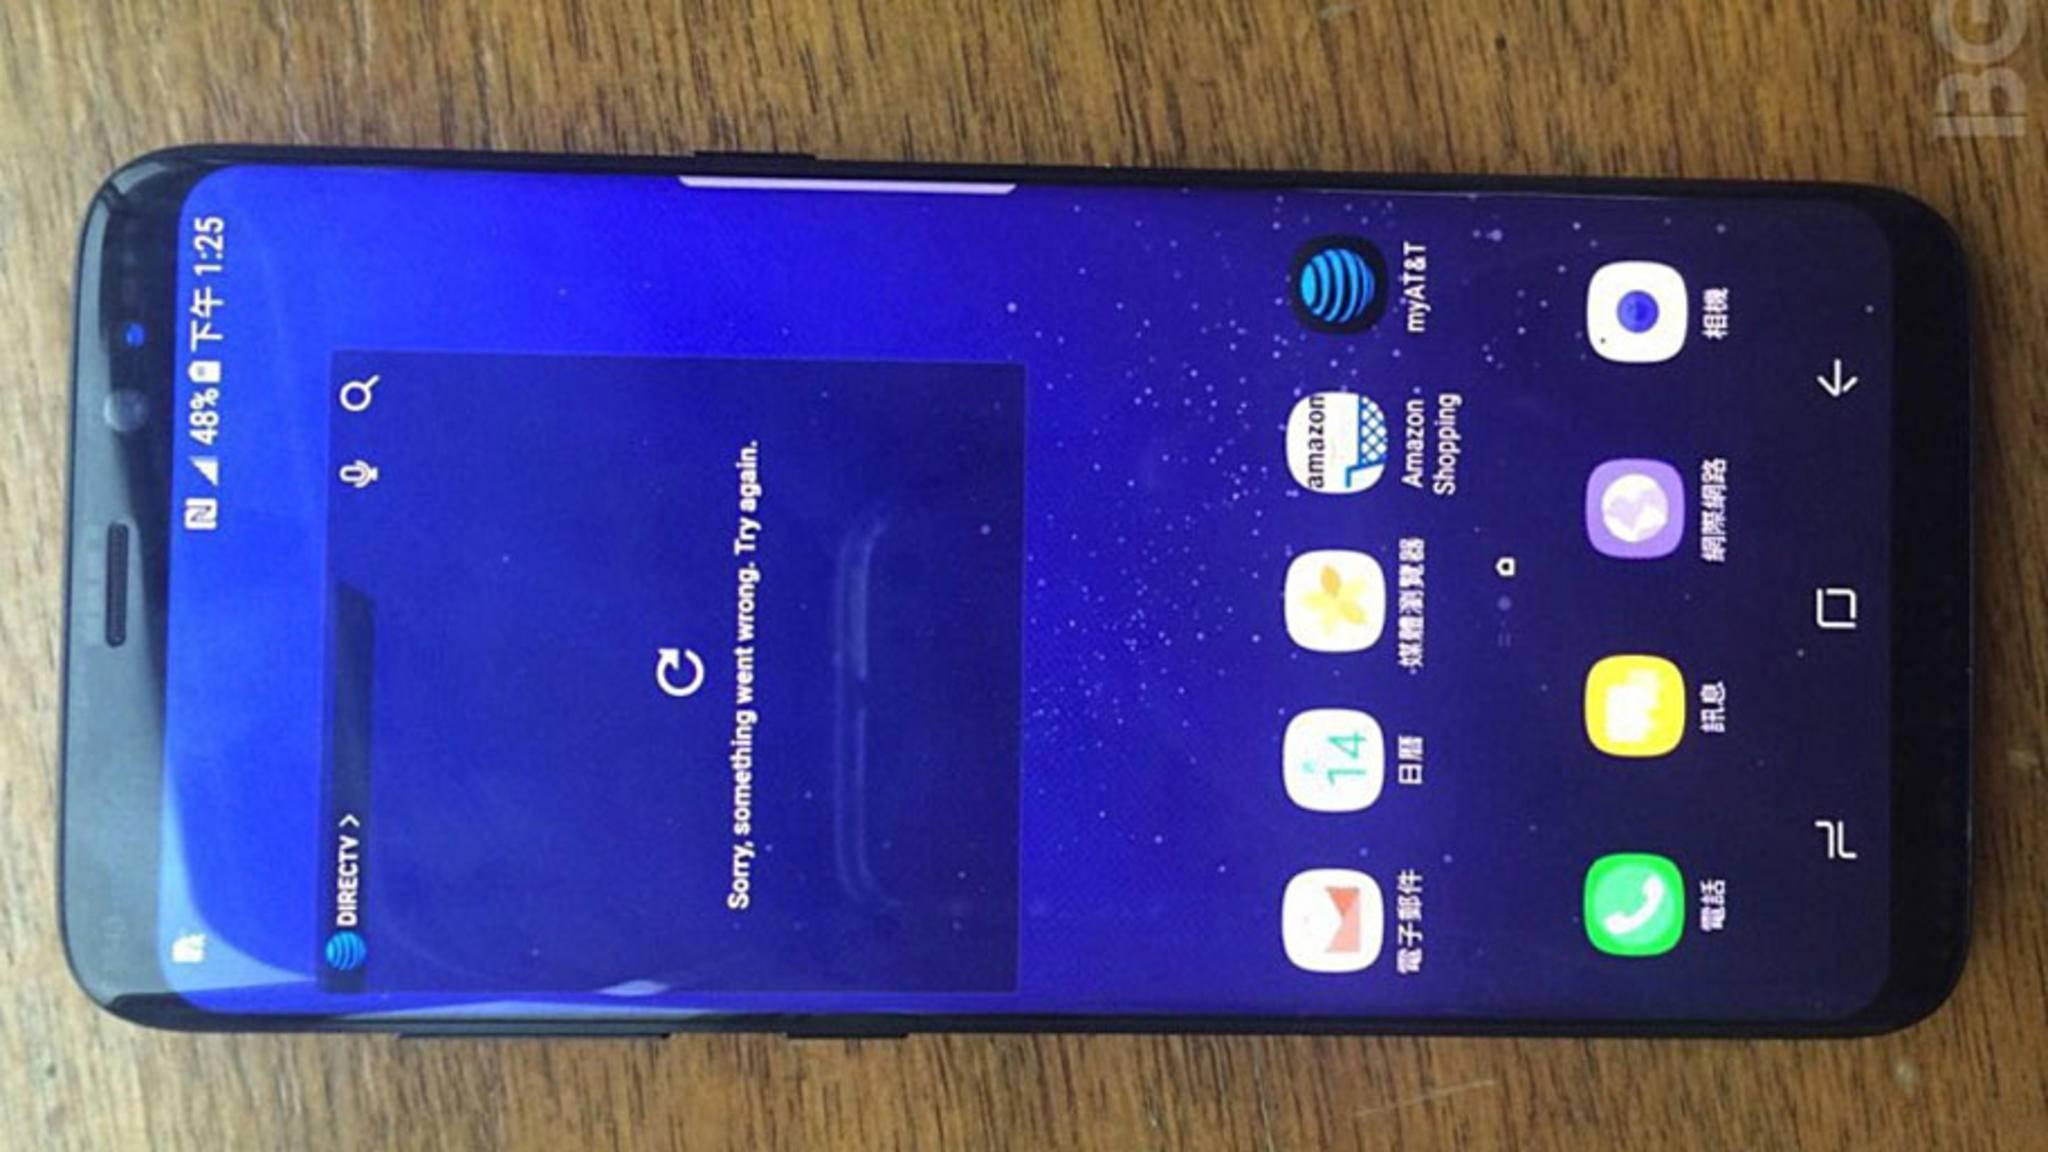 Das Galaxy S8 in freier Wildbahn: So soll es aussehen.